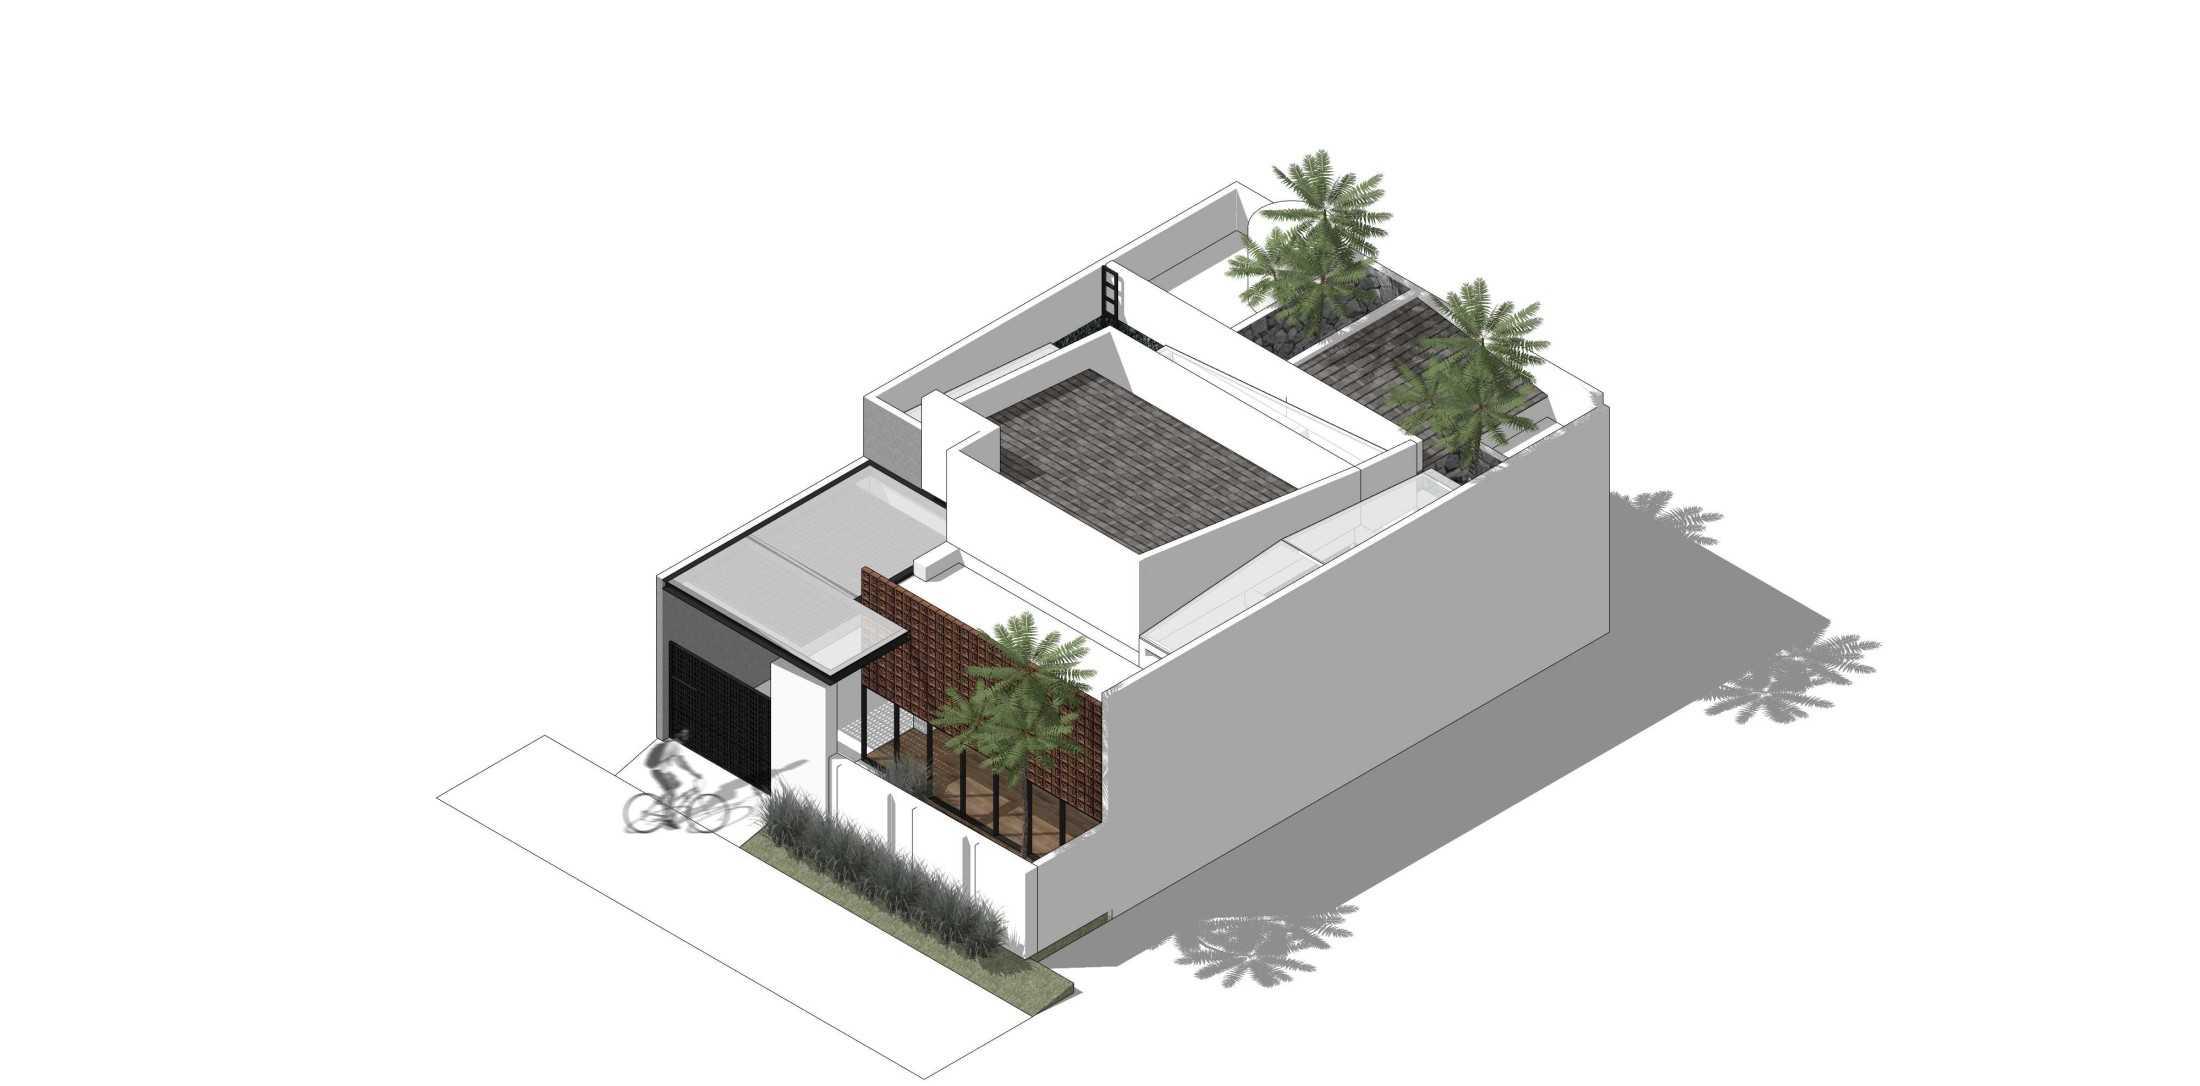 Bakaragu.id Ghina House Madiun, Kota Madiun, Jawa Timur, Indonesia Madiun, Kota Madiun, Jawa Timur, Indonesia Bakaraguid-Ghina-House  106304